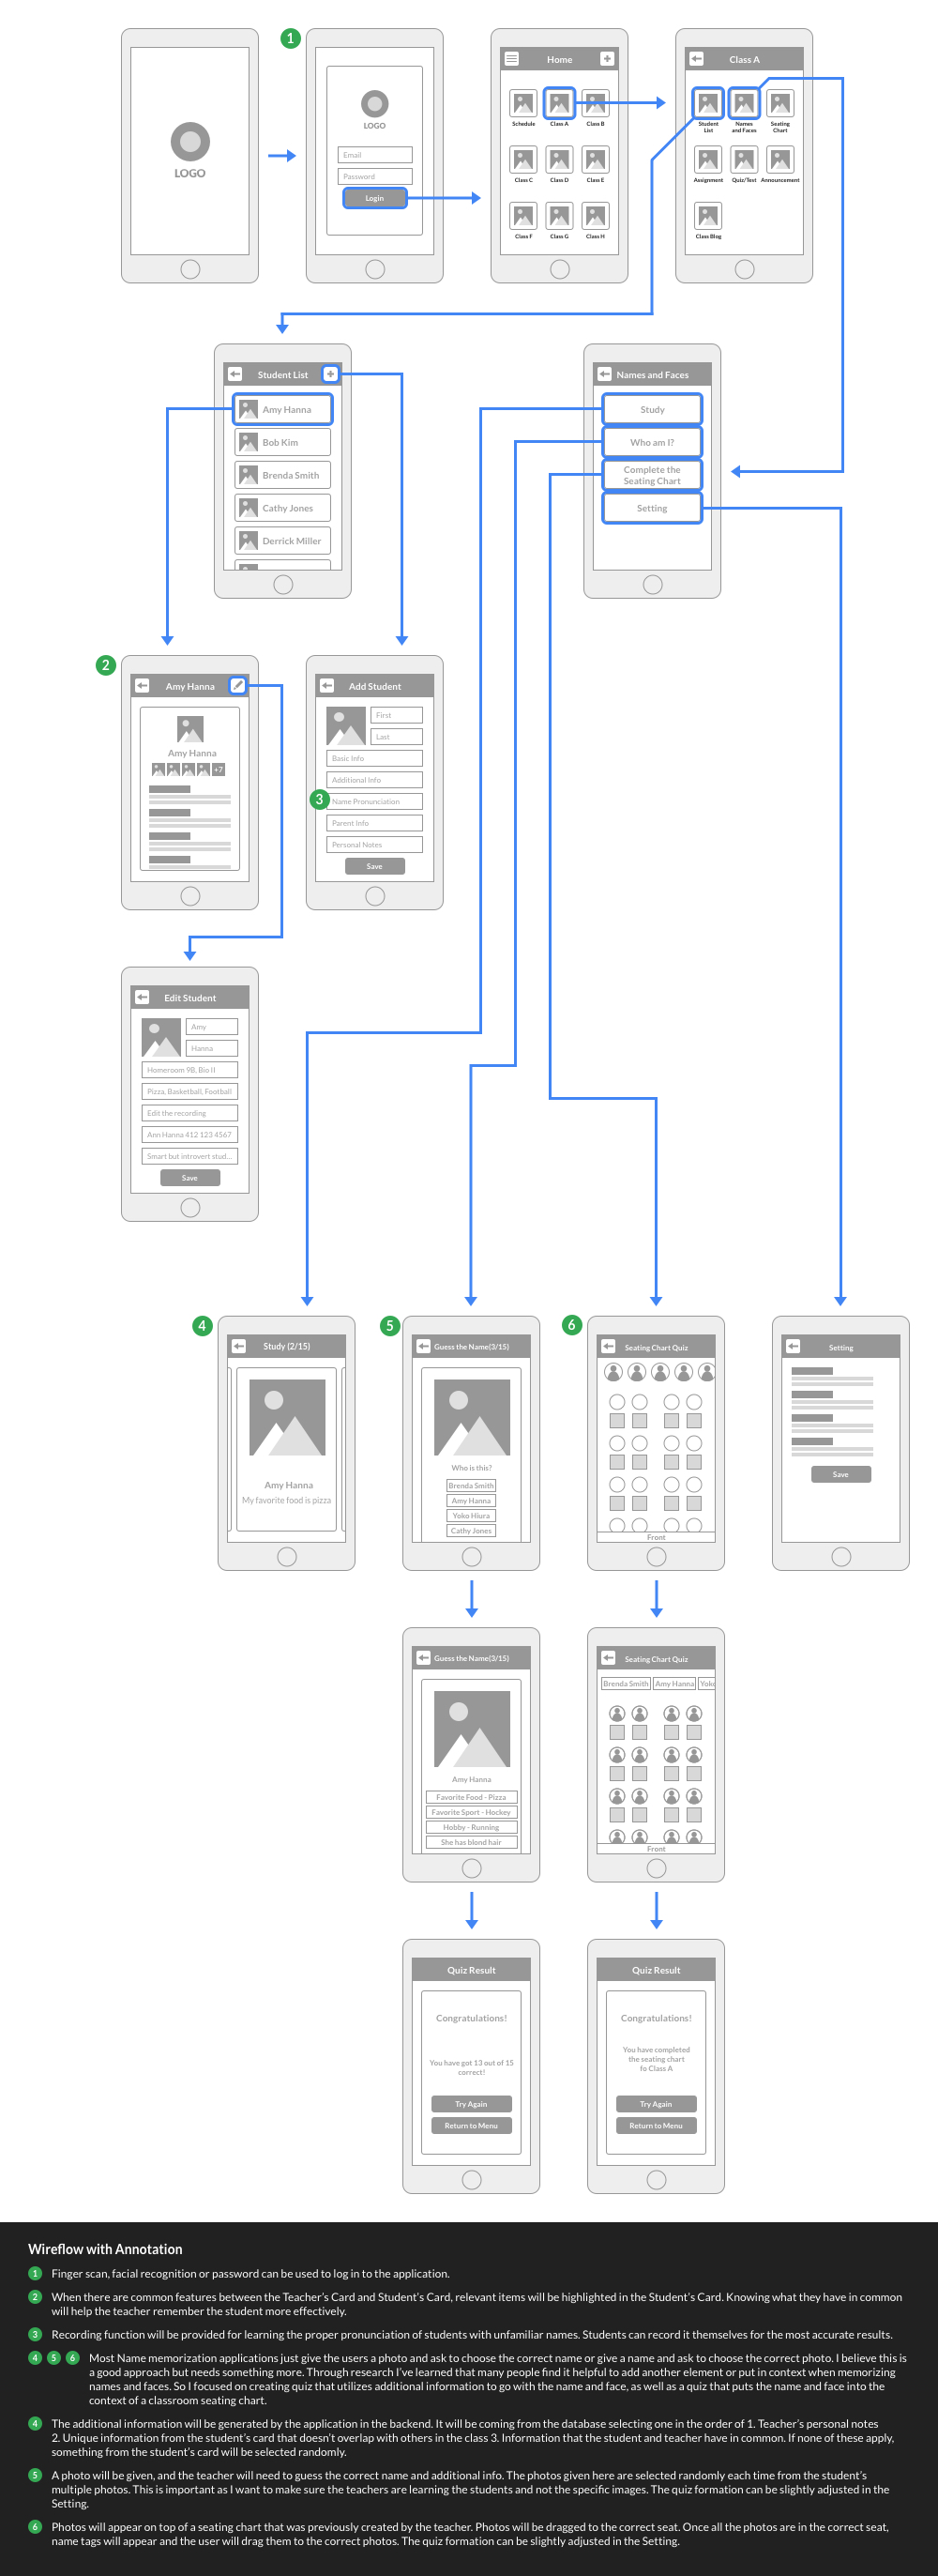 Wireflow.jpg